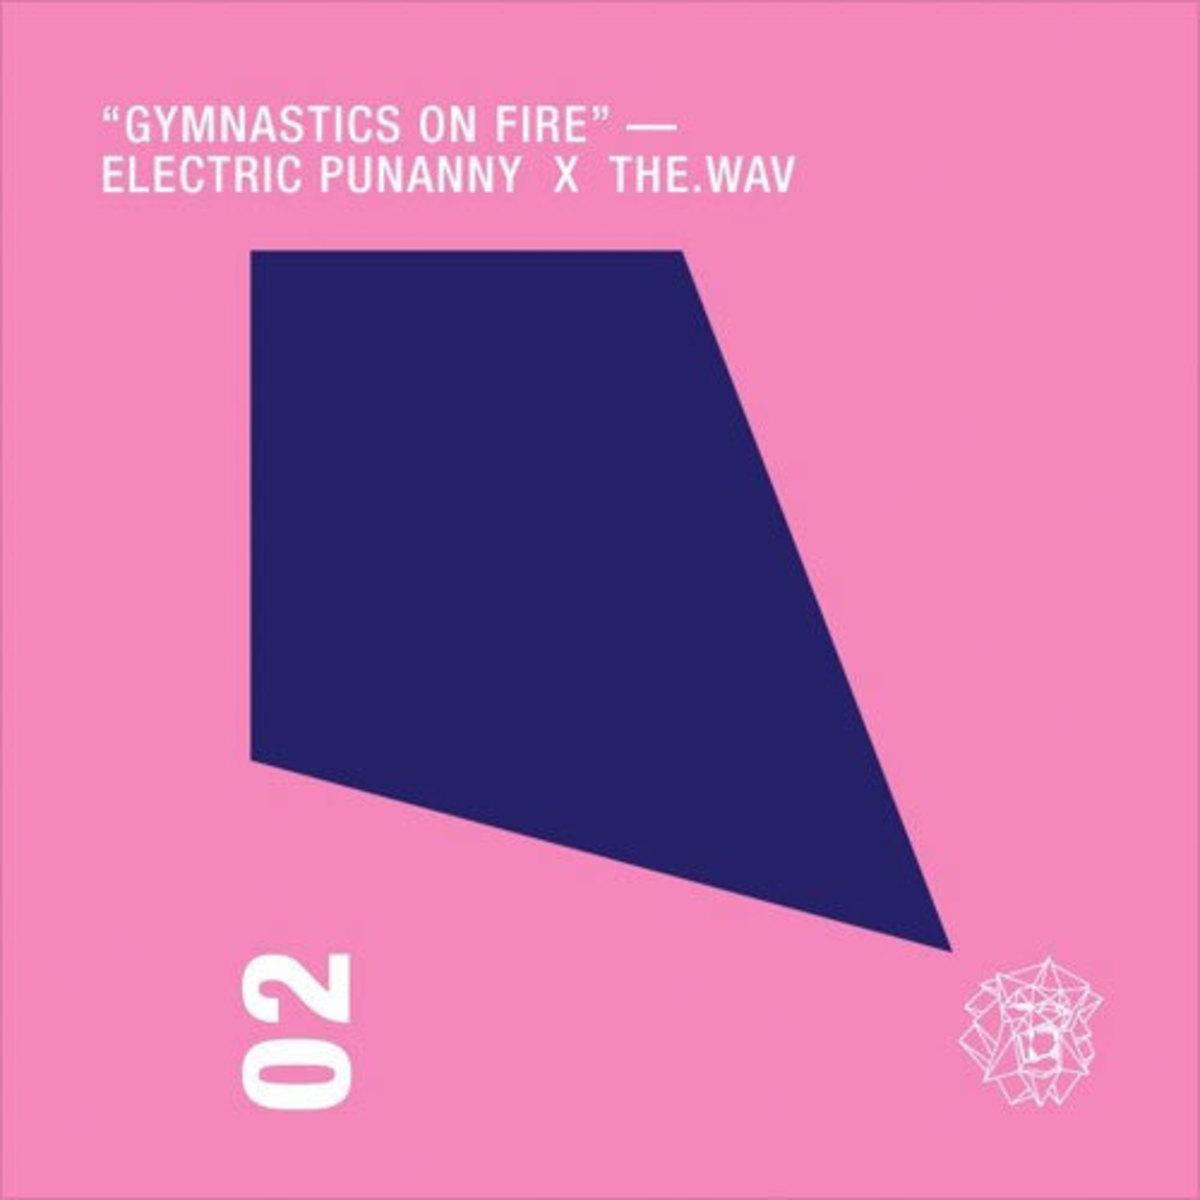 electric-punanny-gymnastics-on-fire.jpg